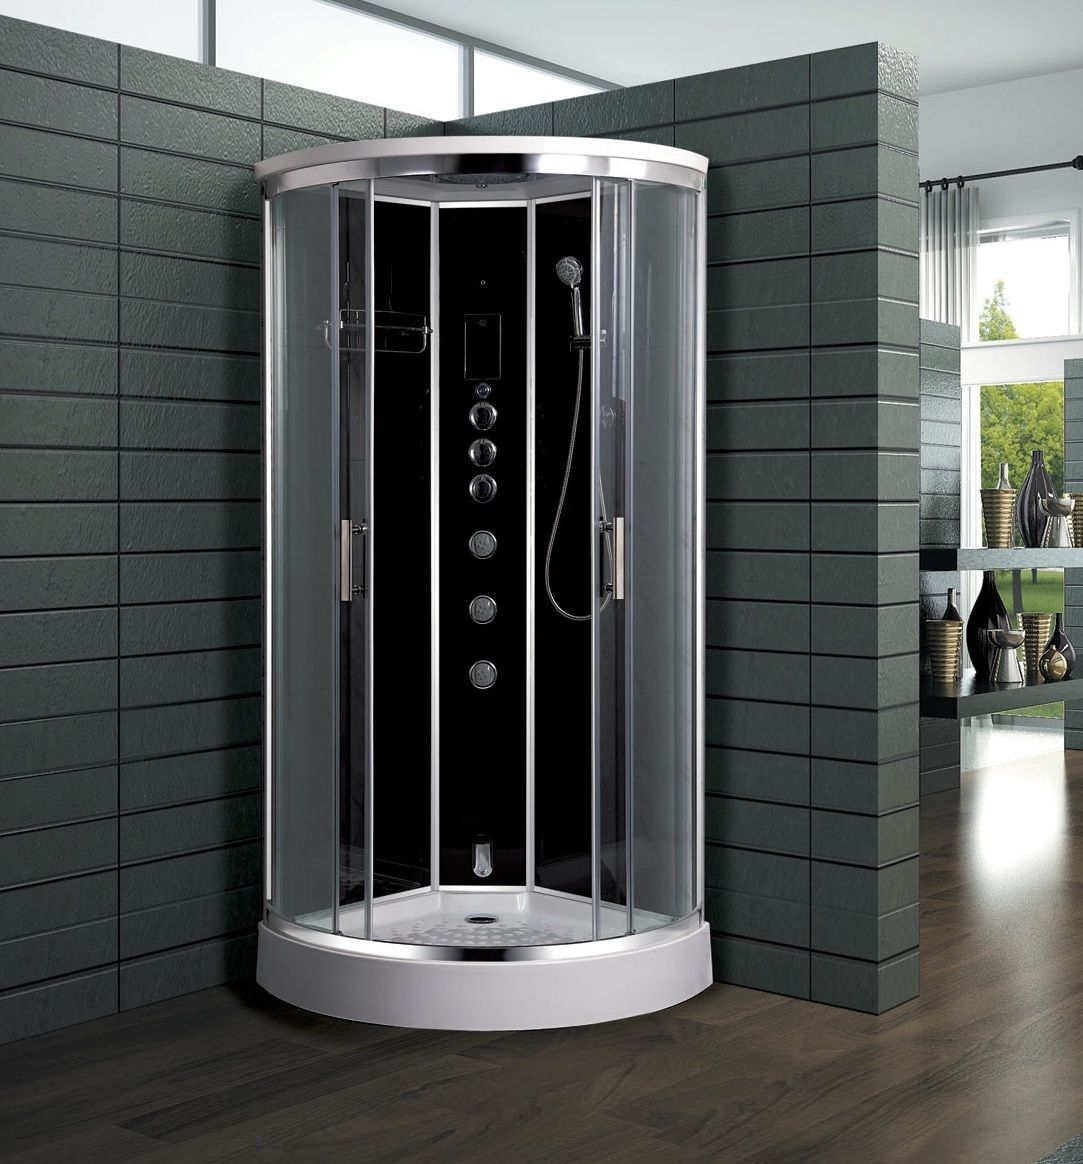 1001now 9010b B Corner Shower Enclosure 32 X 32 Gm Online Store